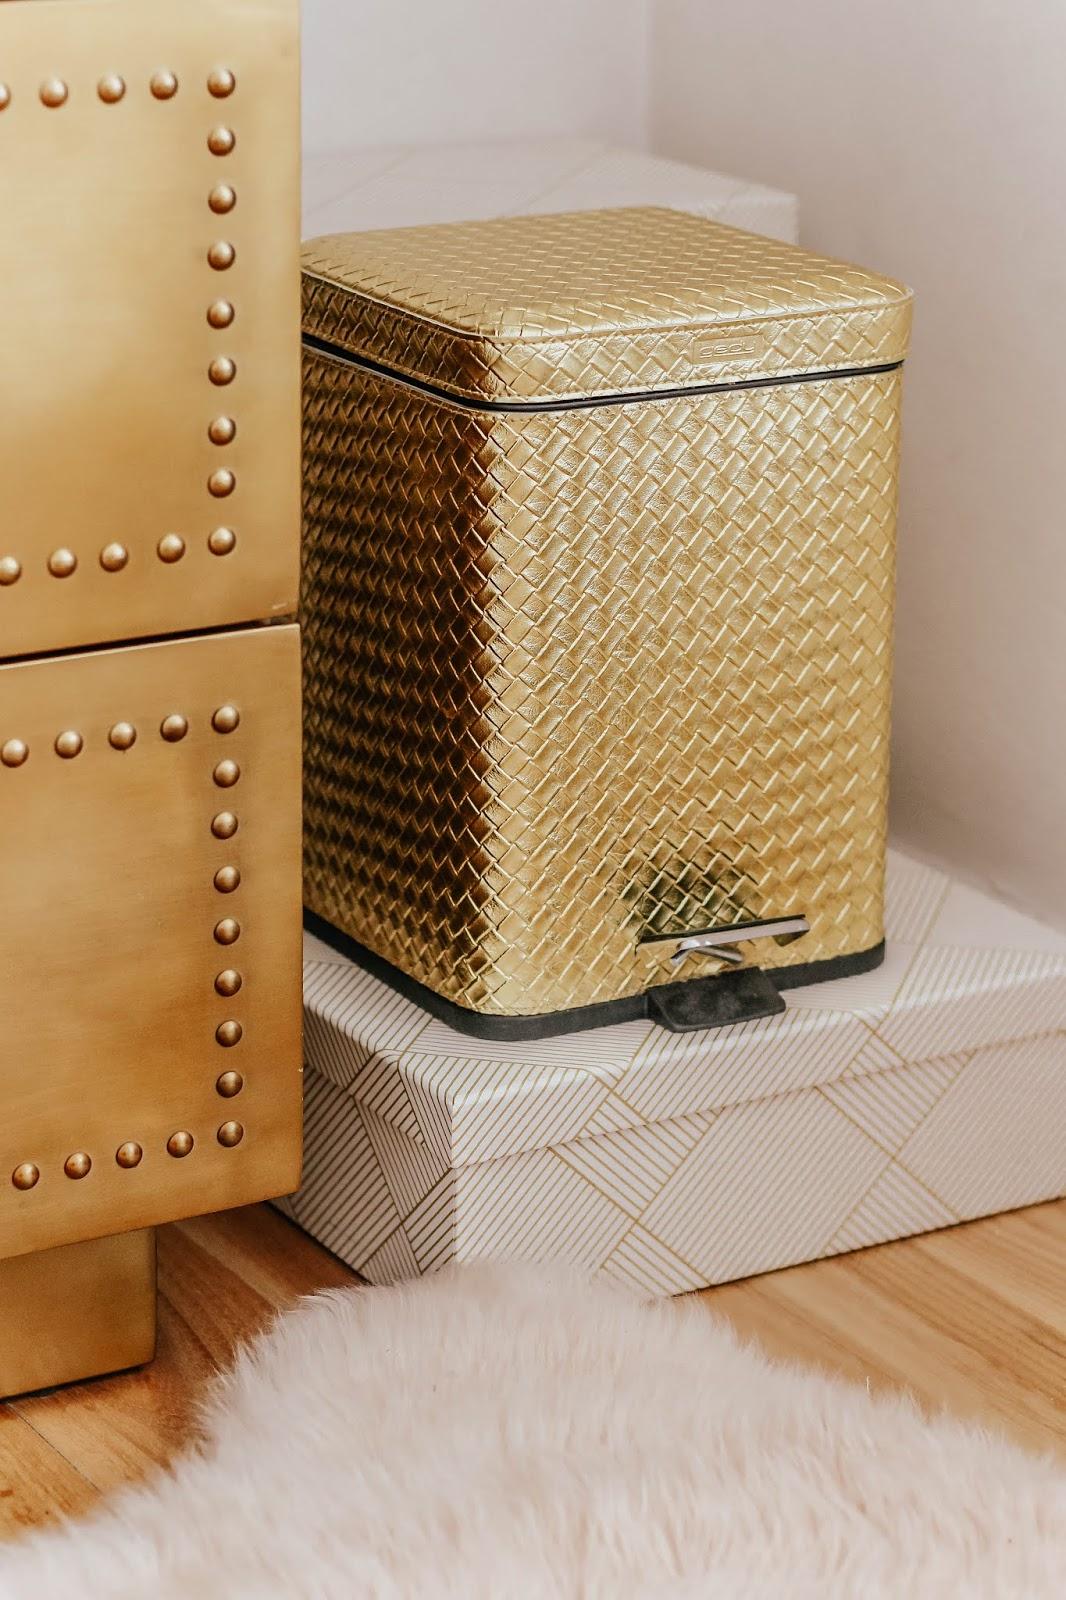 Homeware gold textured pedal bin